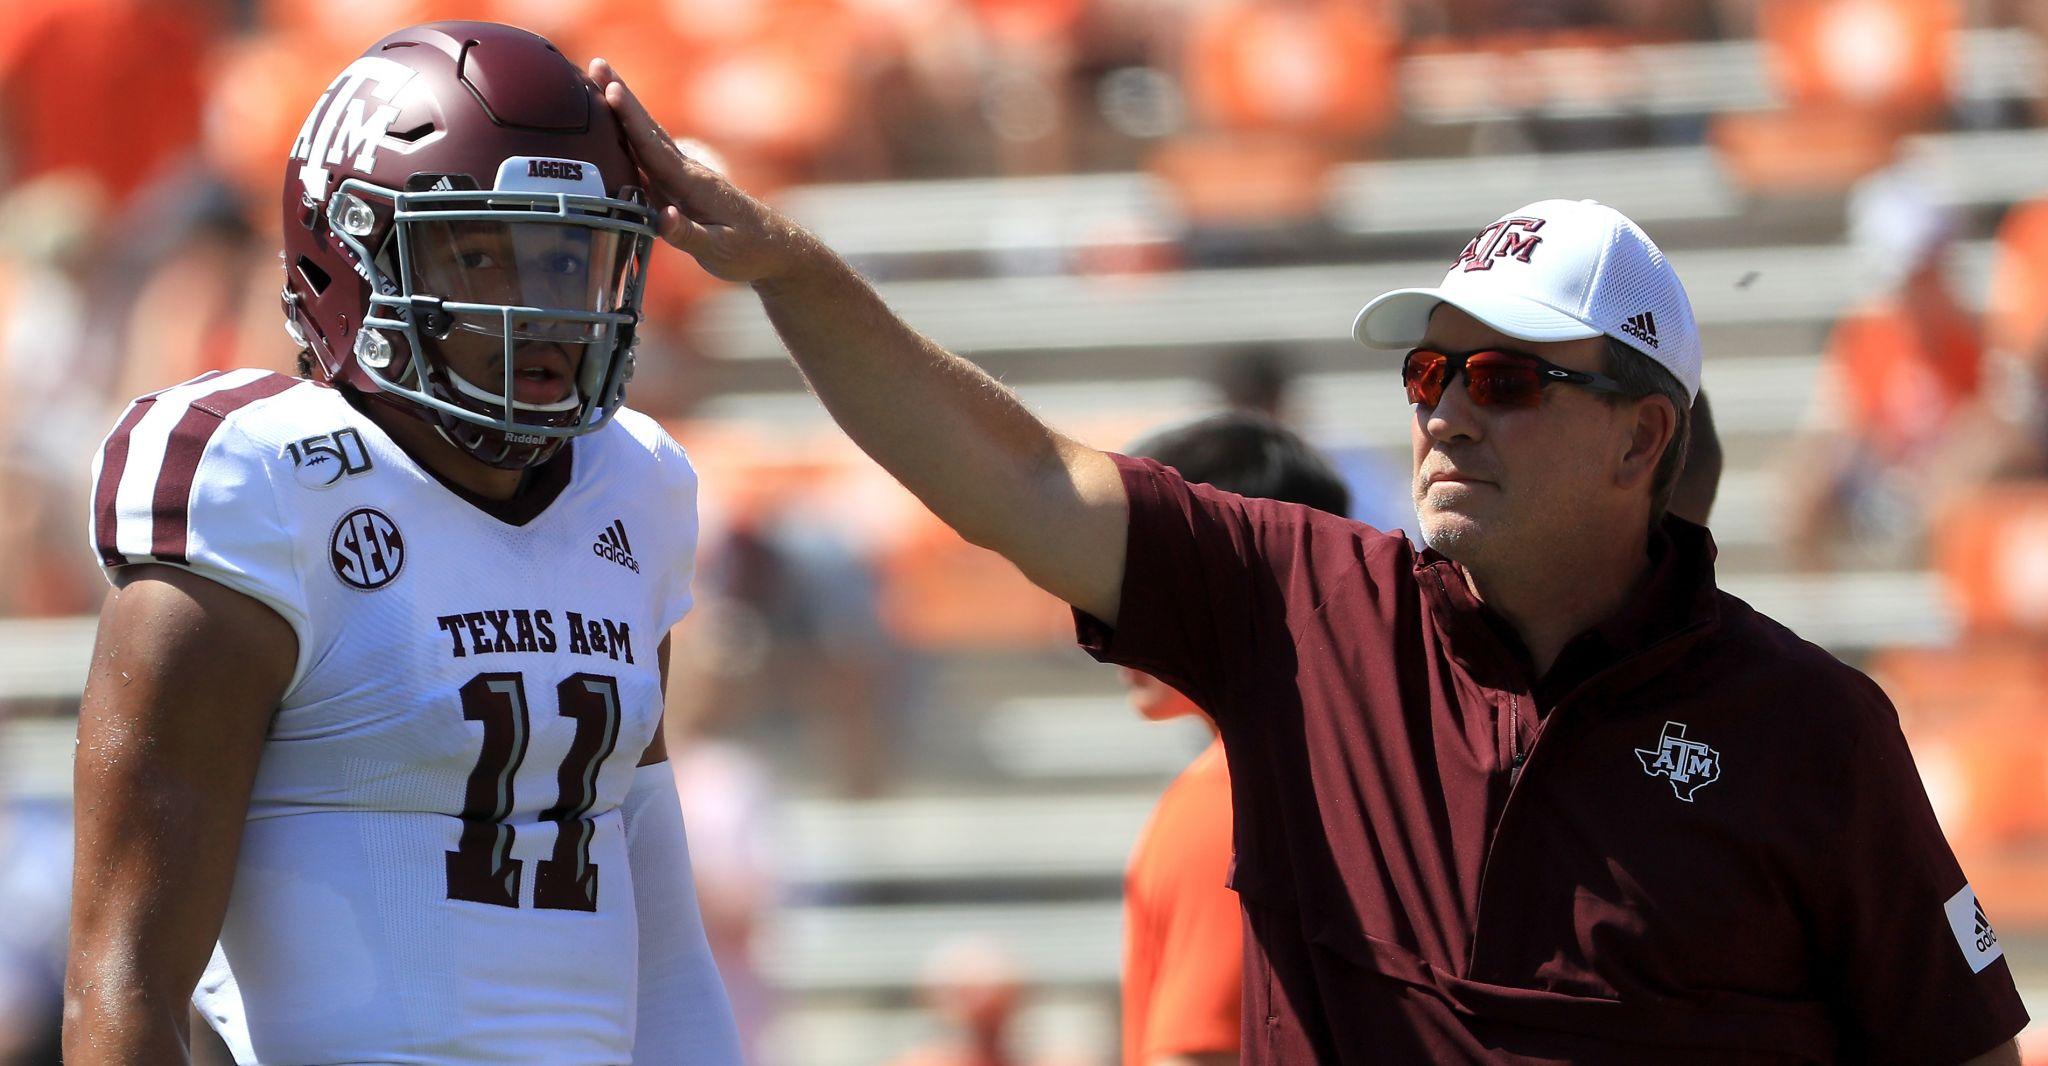 College football preview: Lamar at No. 16 Texas A&M